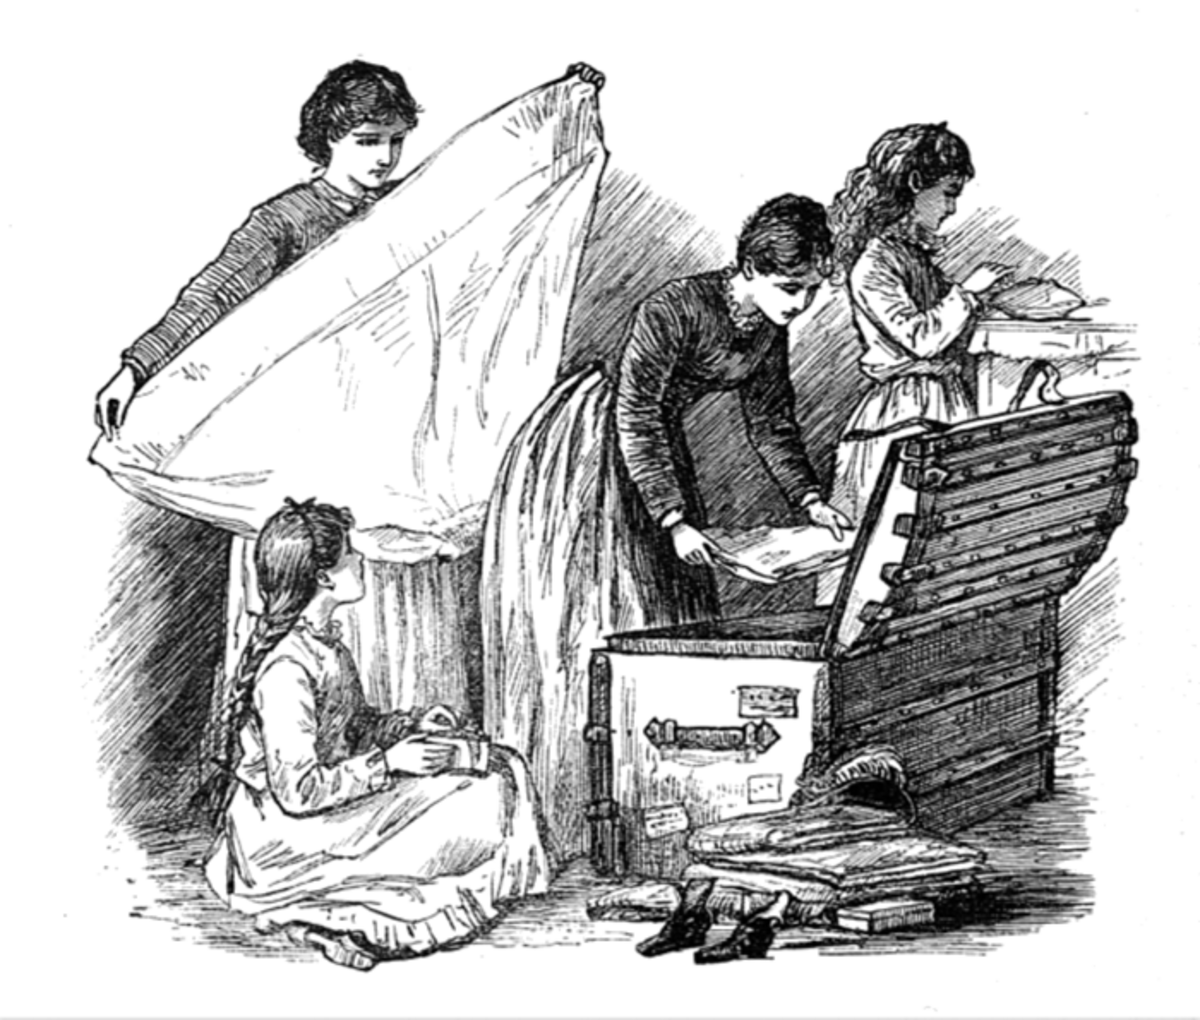 Family in Little Women and Huck Finn